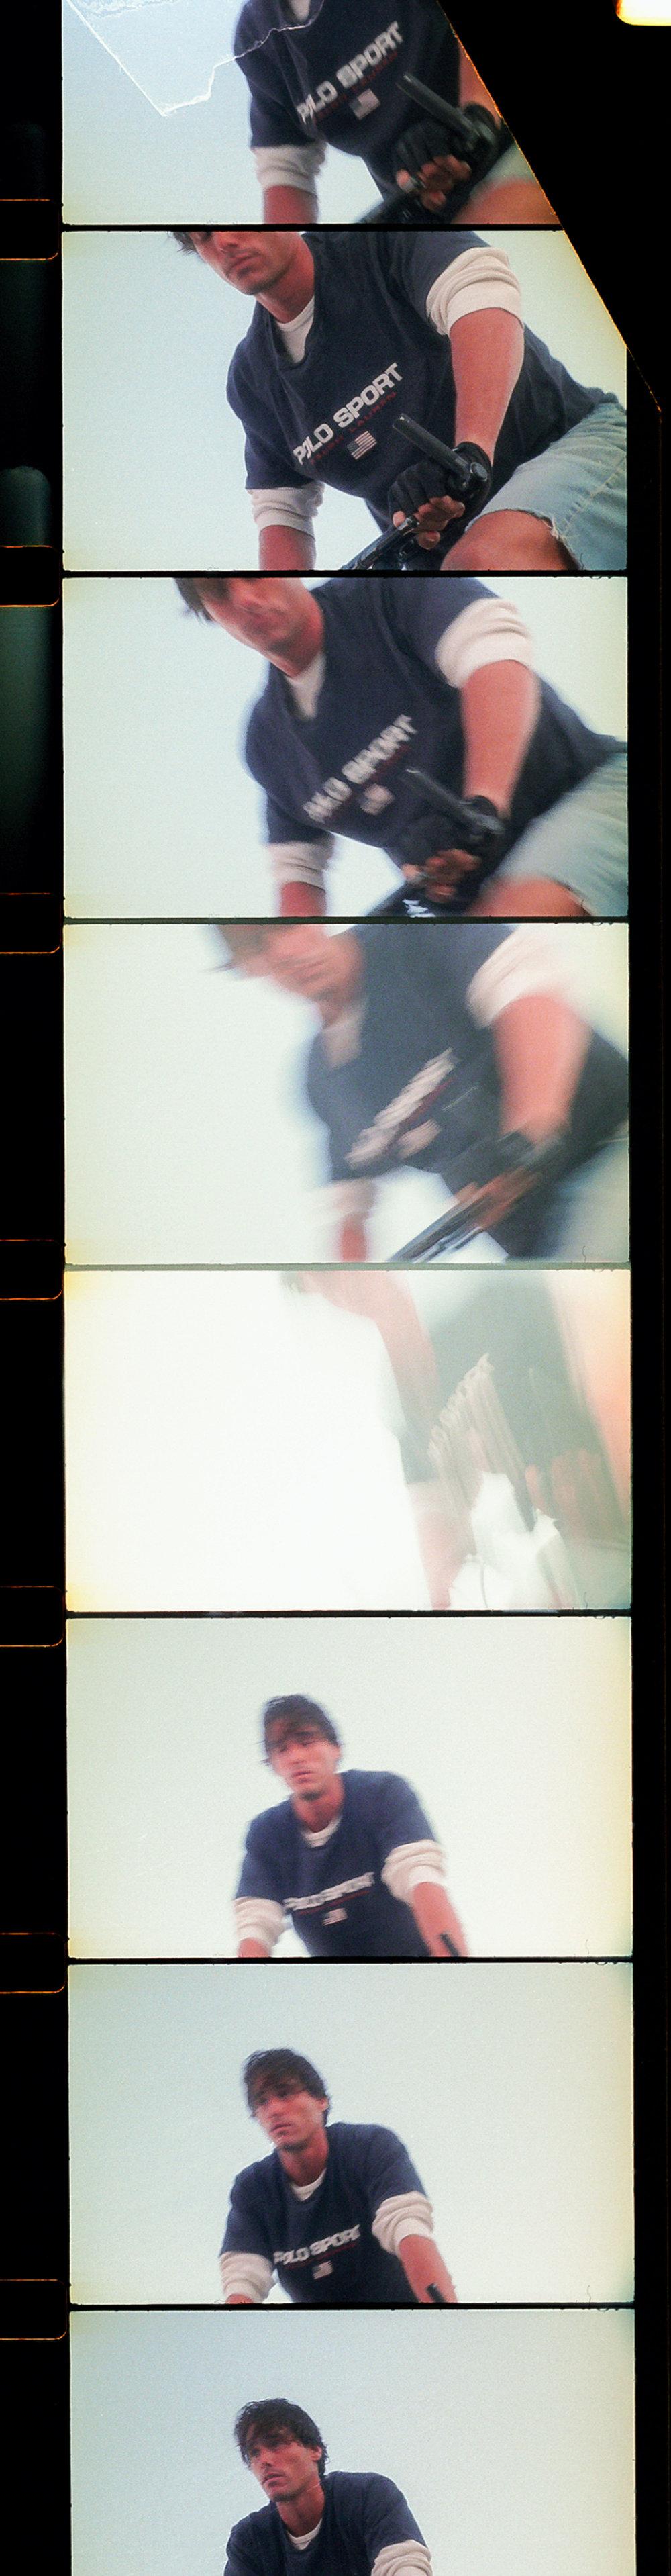 16mm-polo-biker-transition-copy.jpg